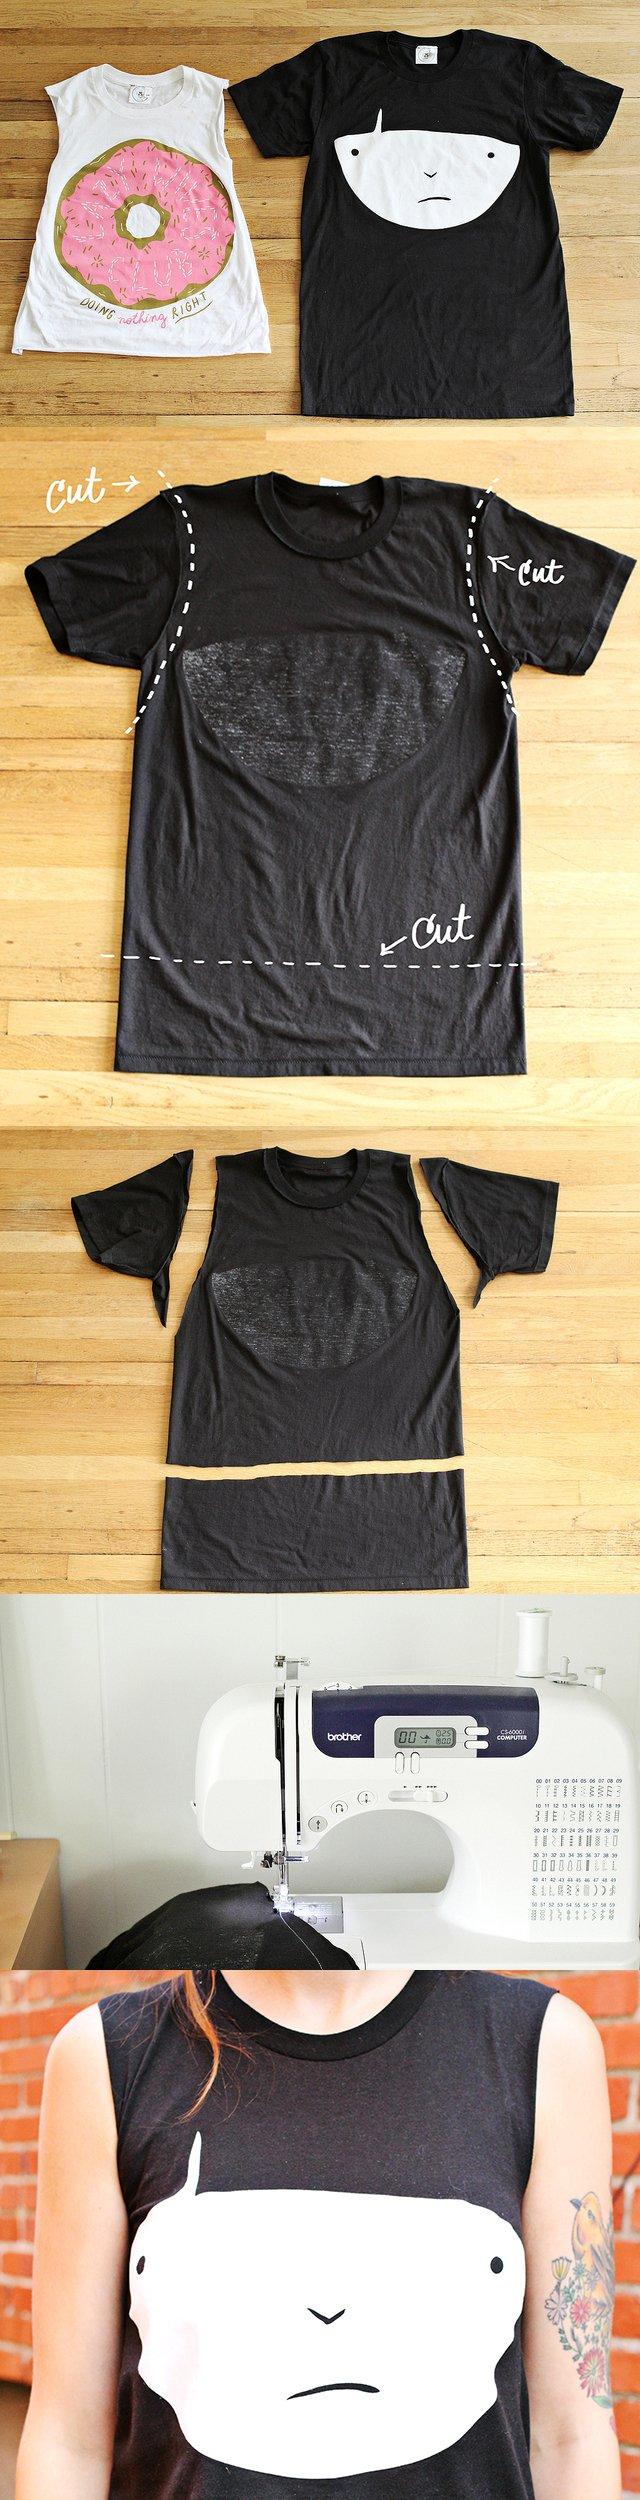 Clothing Tutorials DIY t-shirt